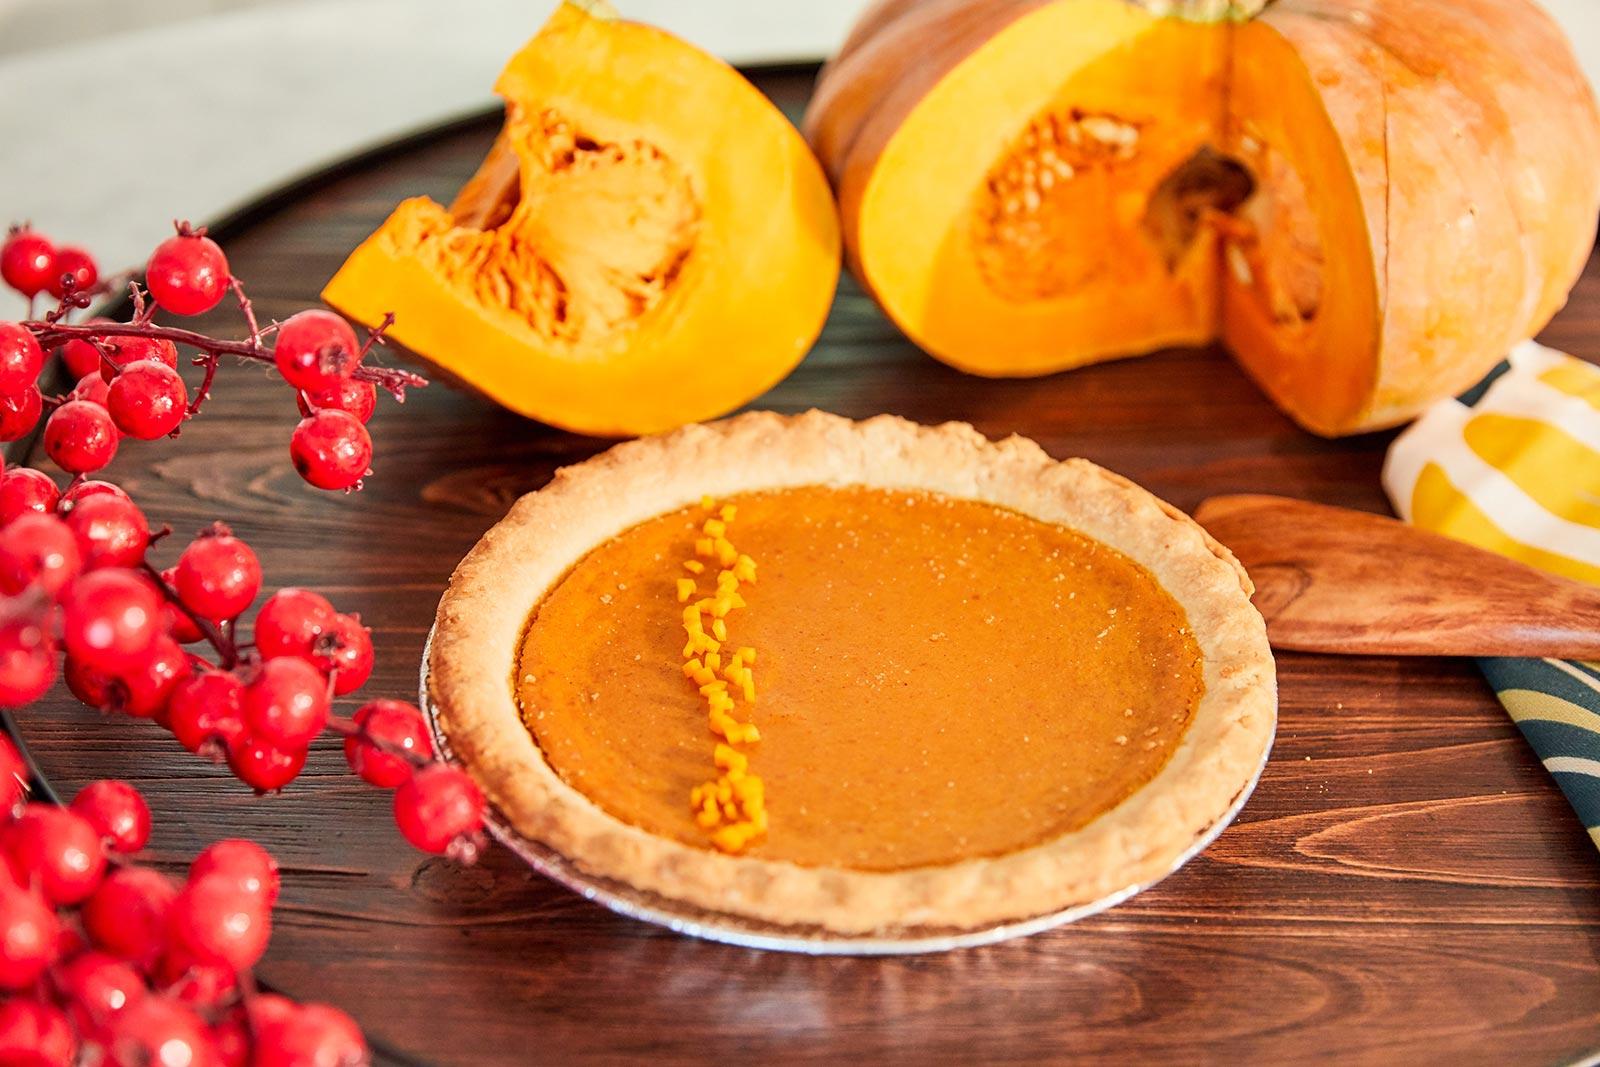 Seasonal fairytale pumpkin pie dessert recipe